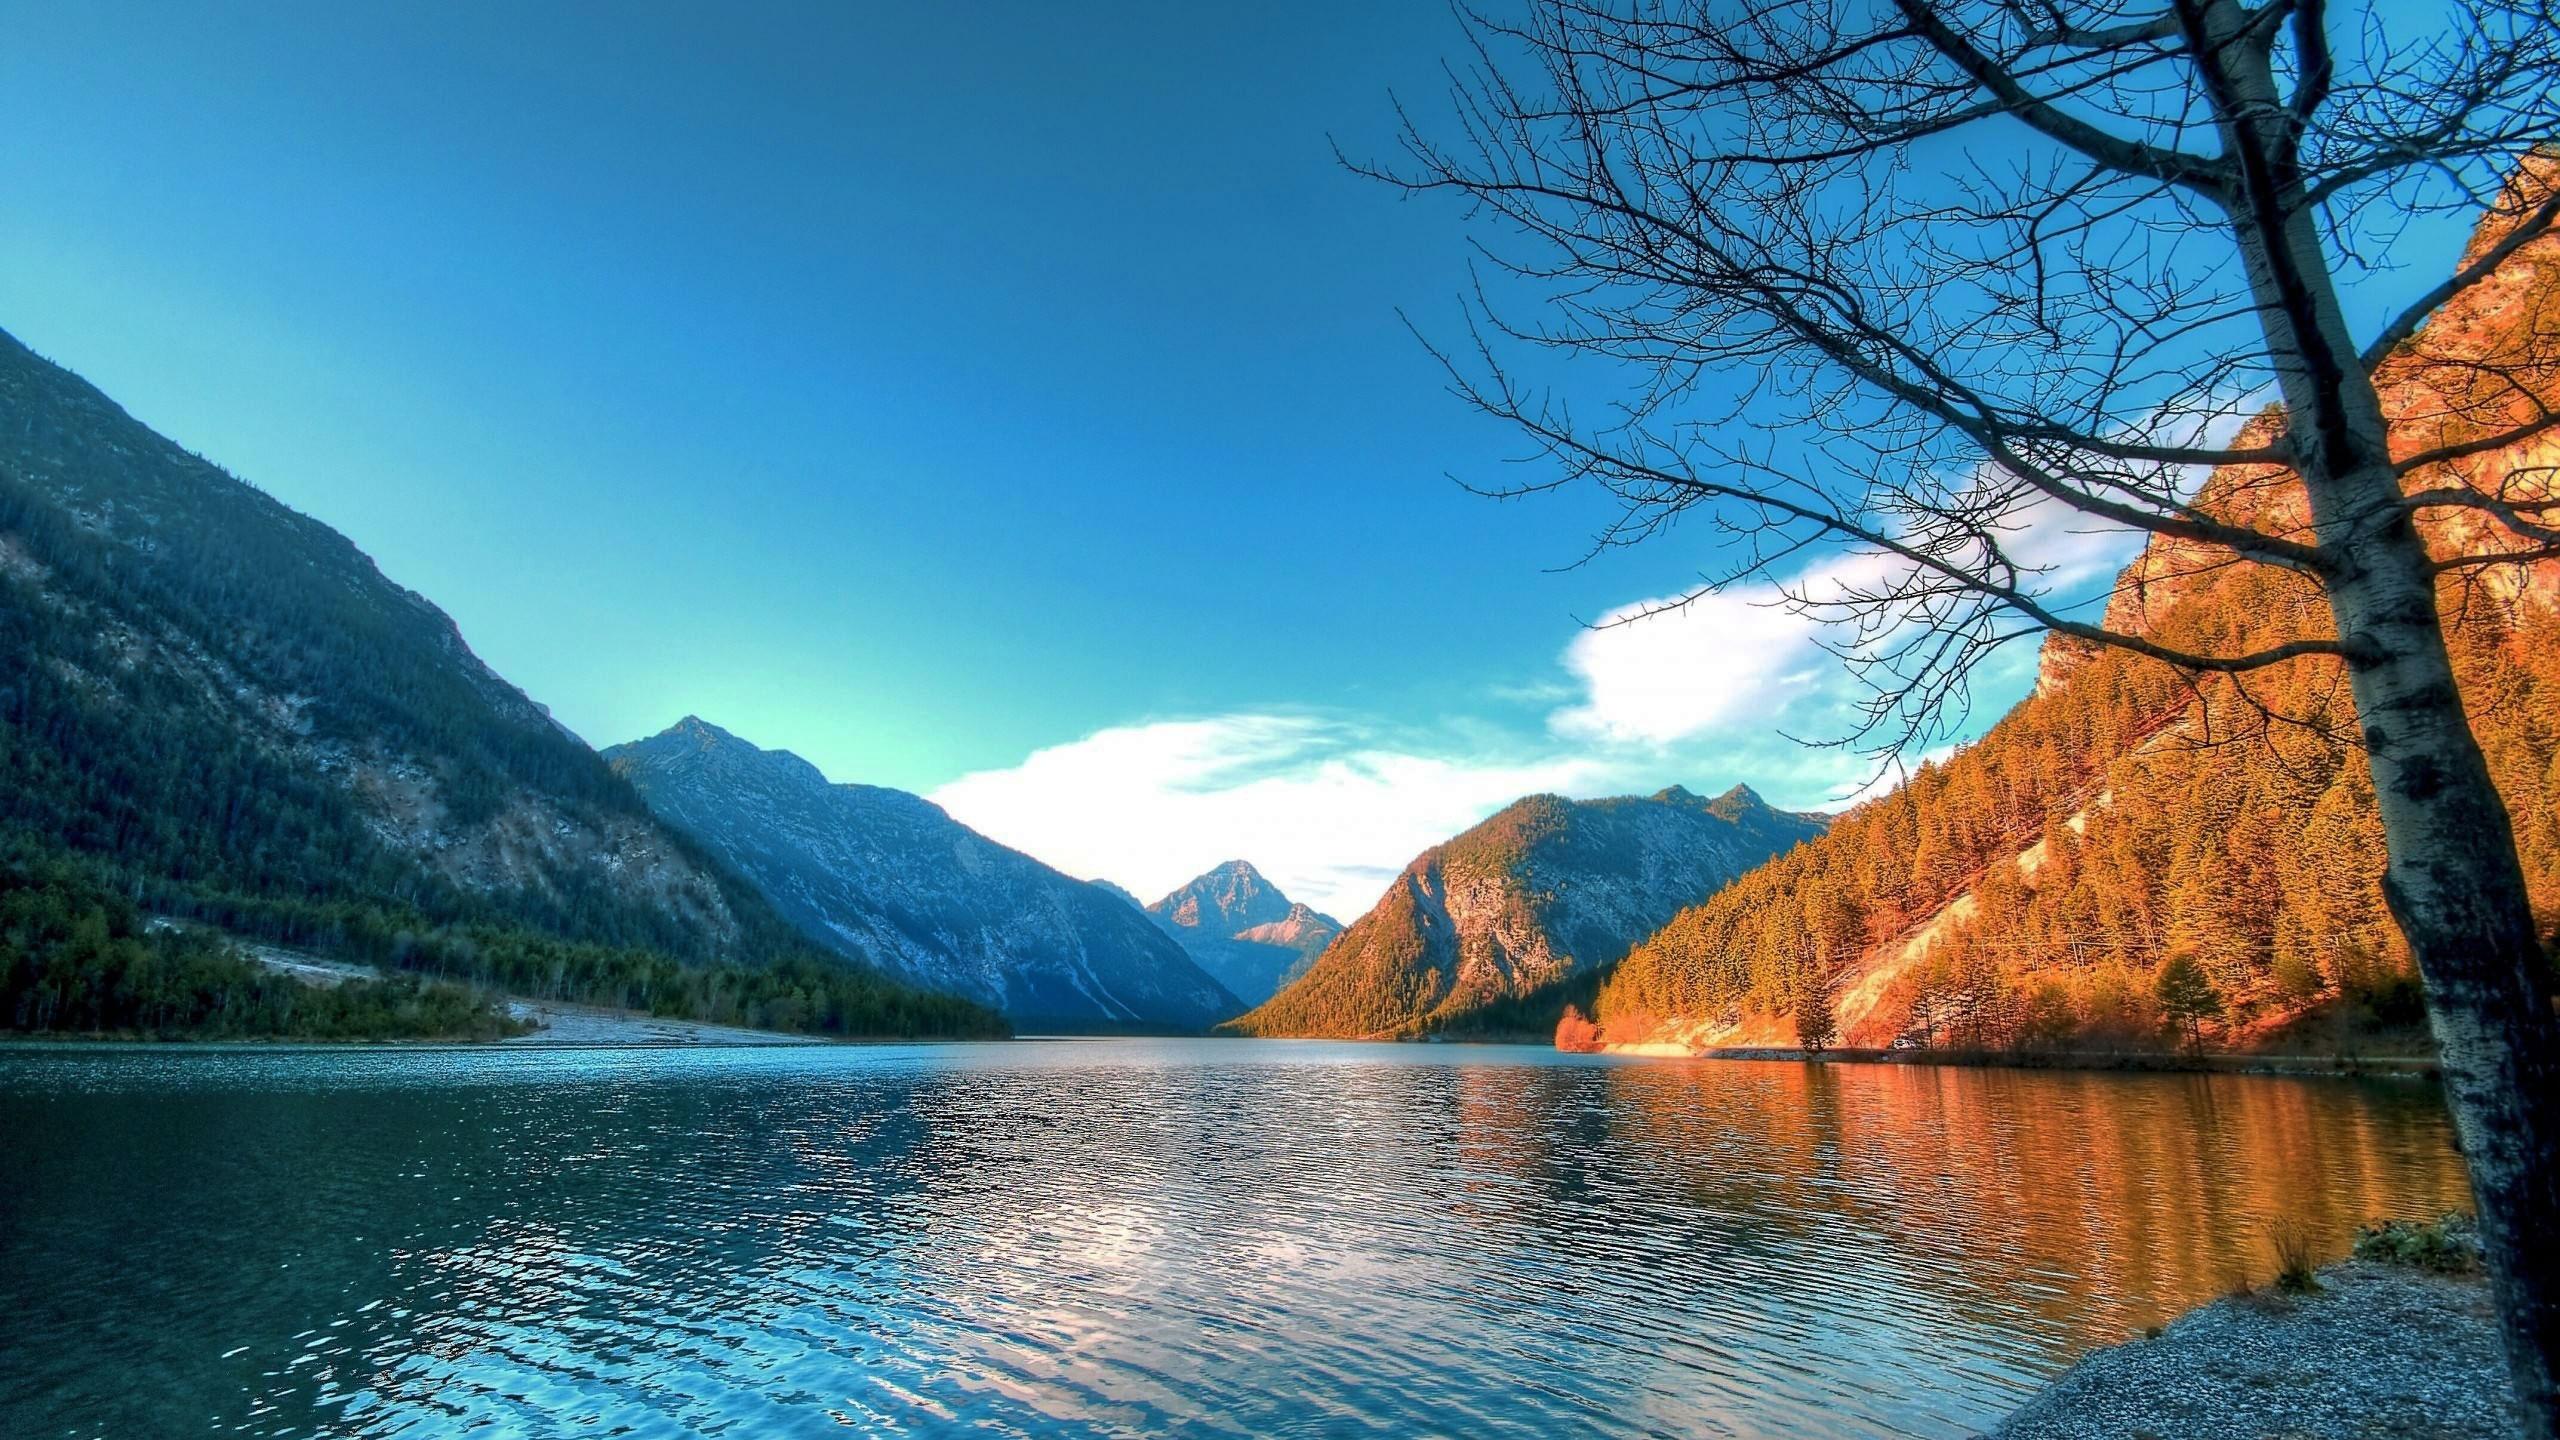 Backgrounds For High Resolution Nature Desktop Backgrounds | www ...